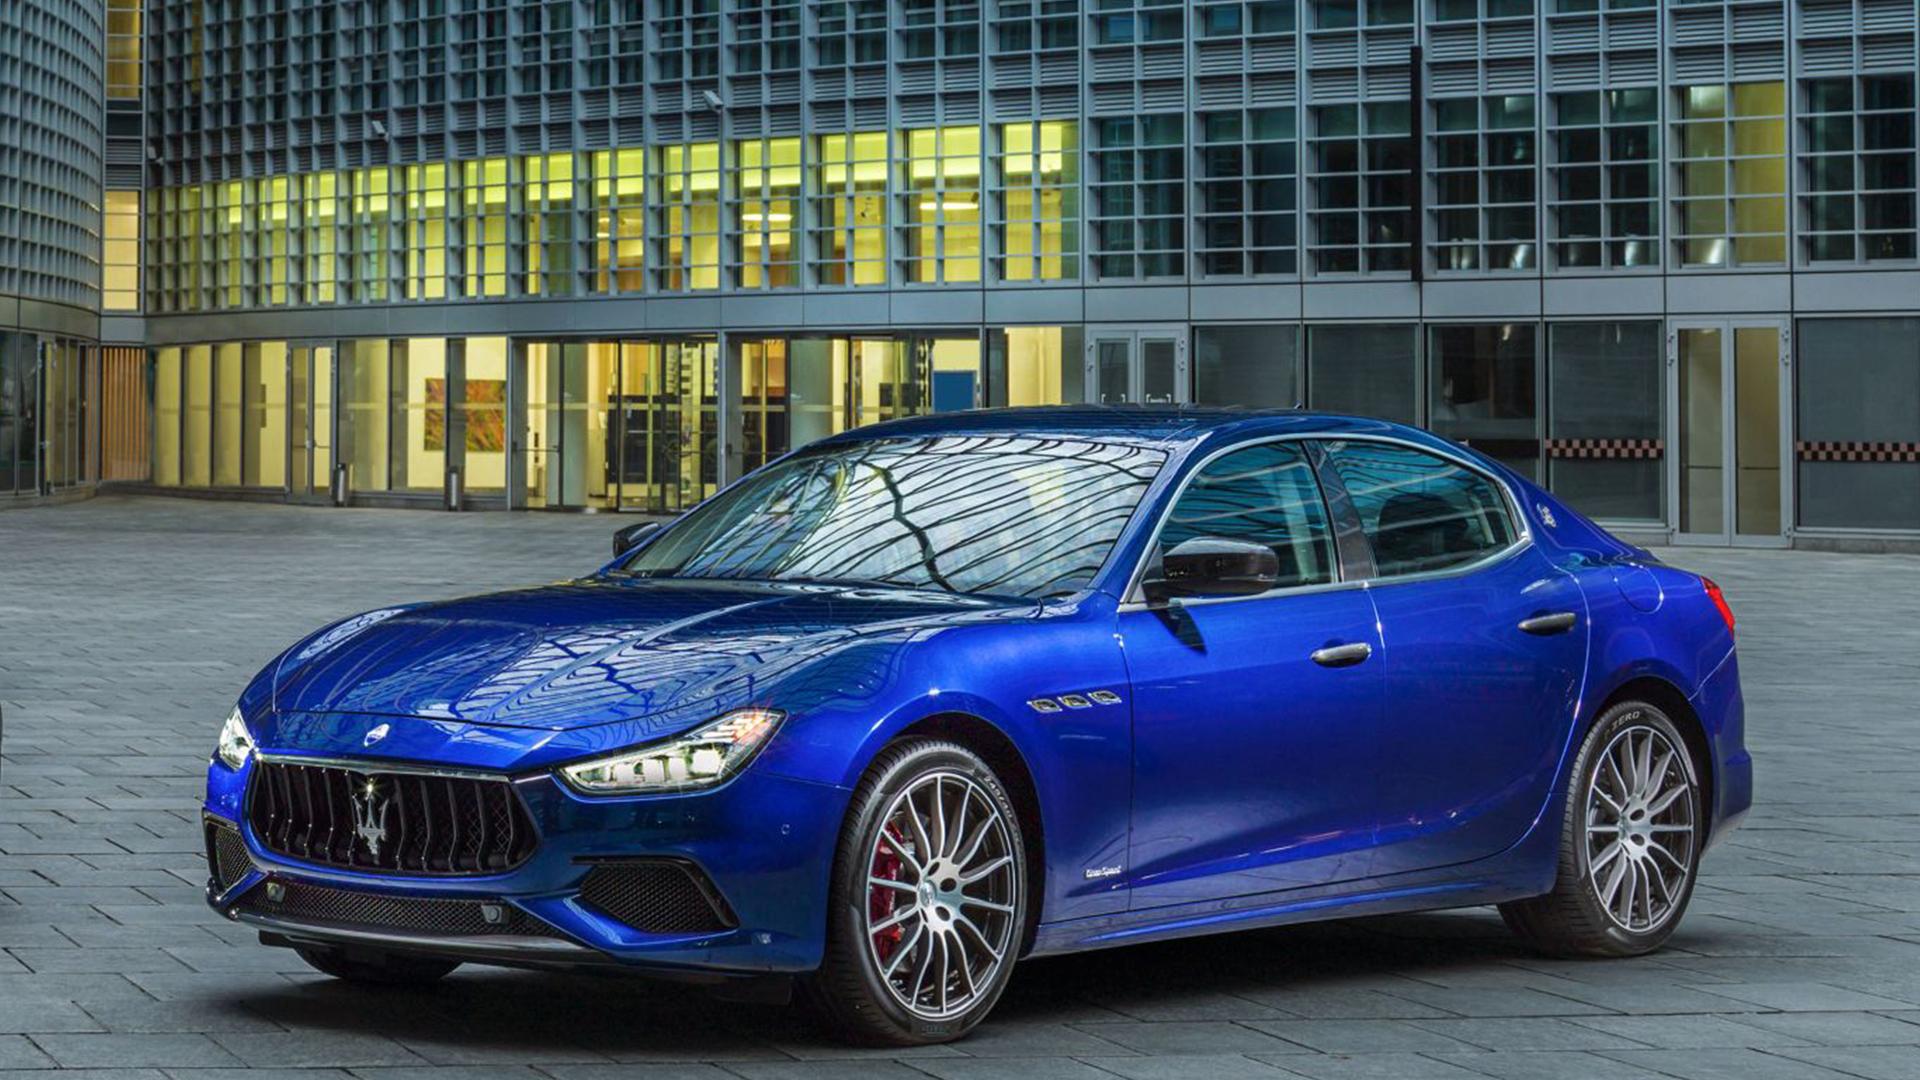 Maserati Ghibli 2018 STD Exterior Car Photos - Overdrive